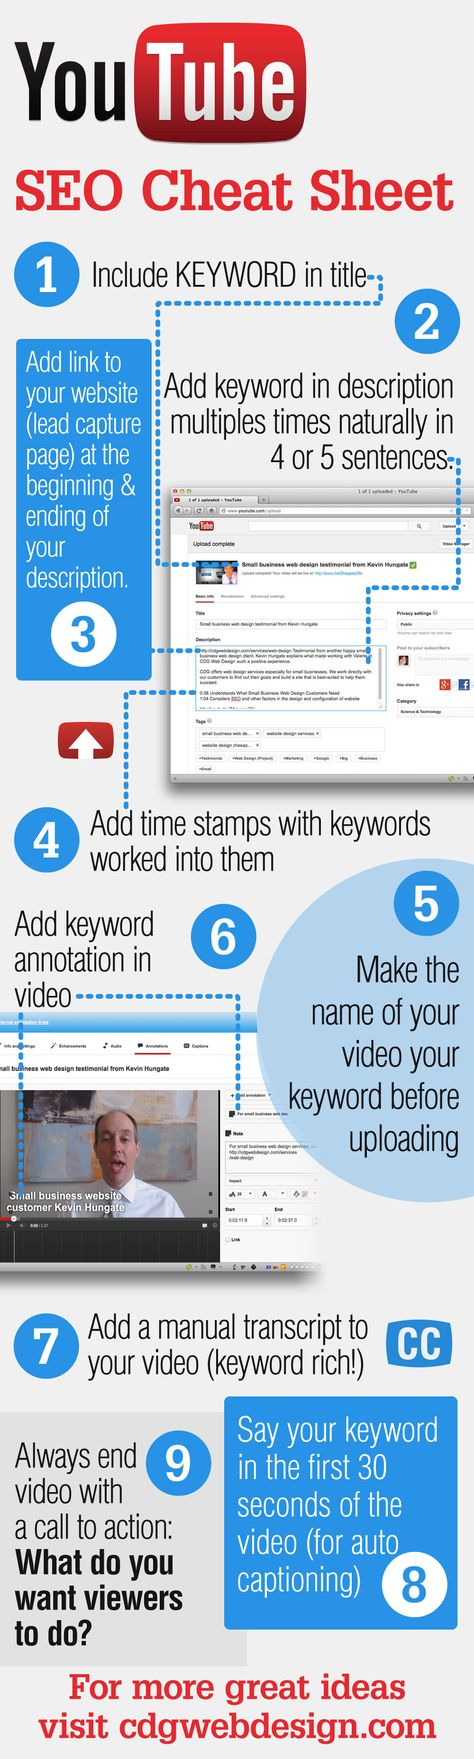 YouTube SEO Cheat Sheet | Advertising | CDG Marketing & Web Design